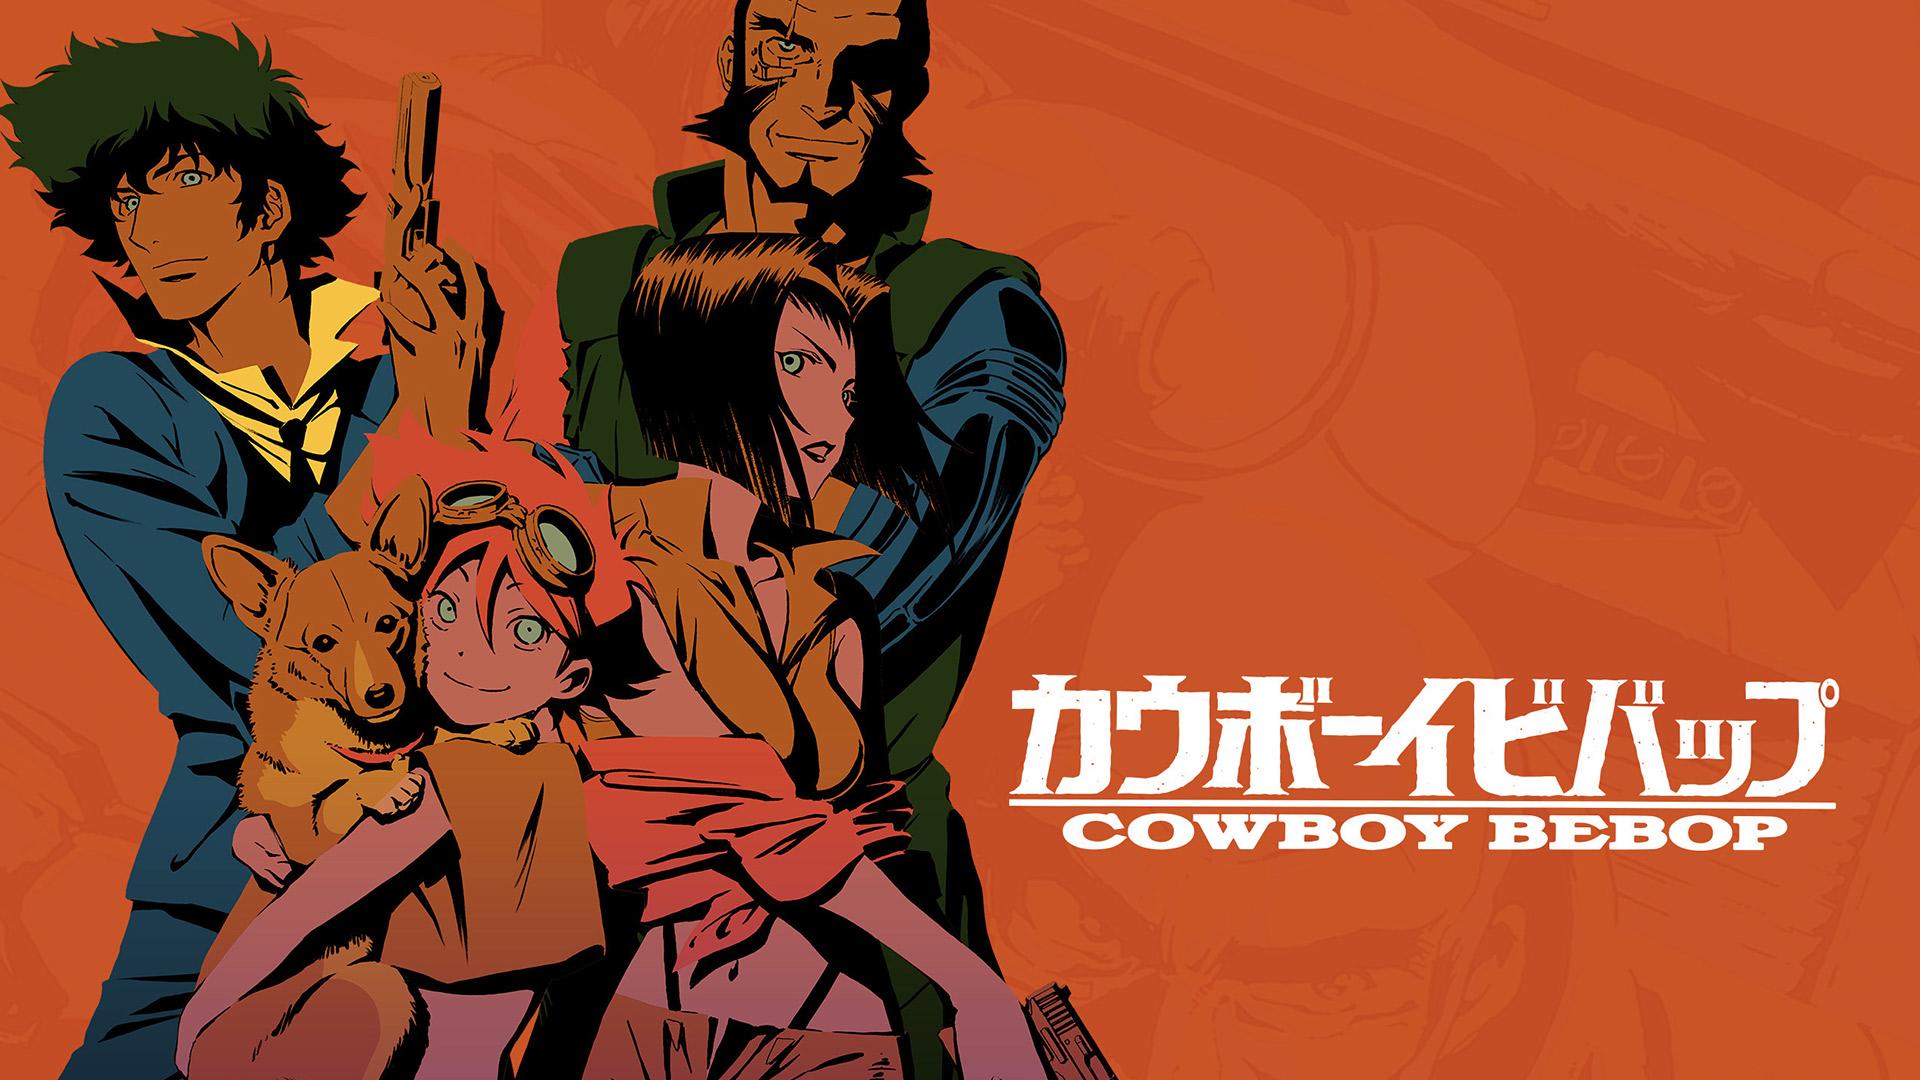 Check Out the Top 5 Cowboy Bebop Episodes